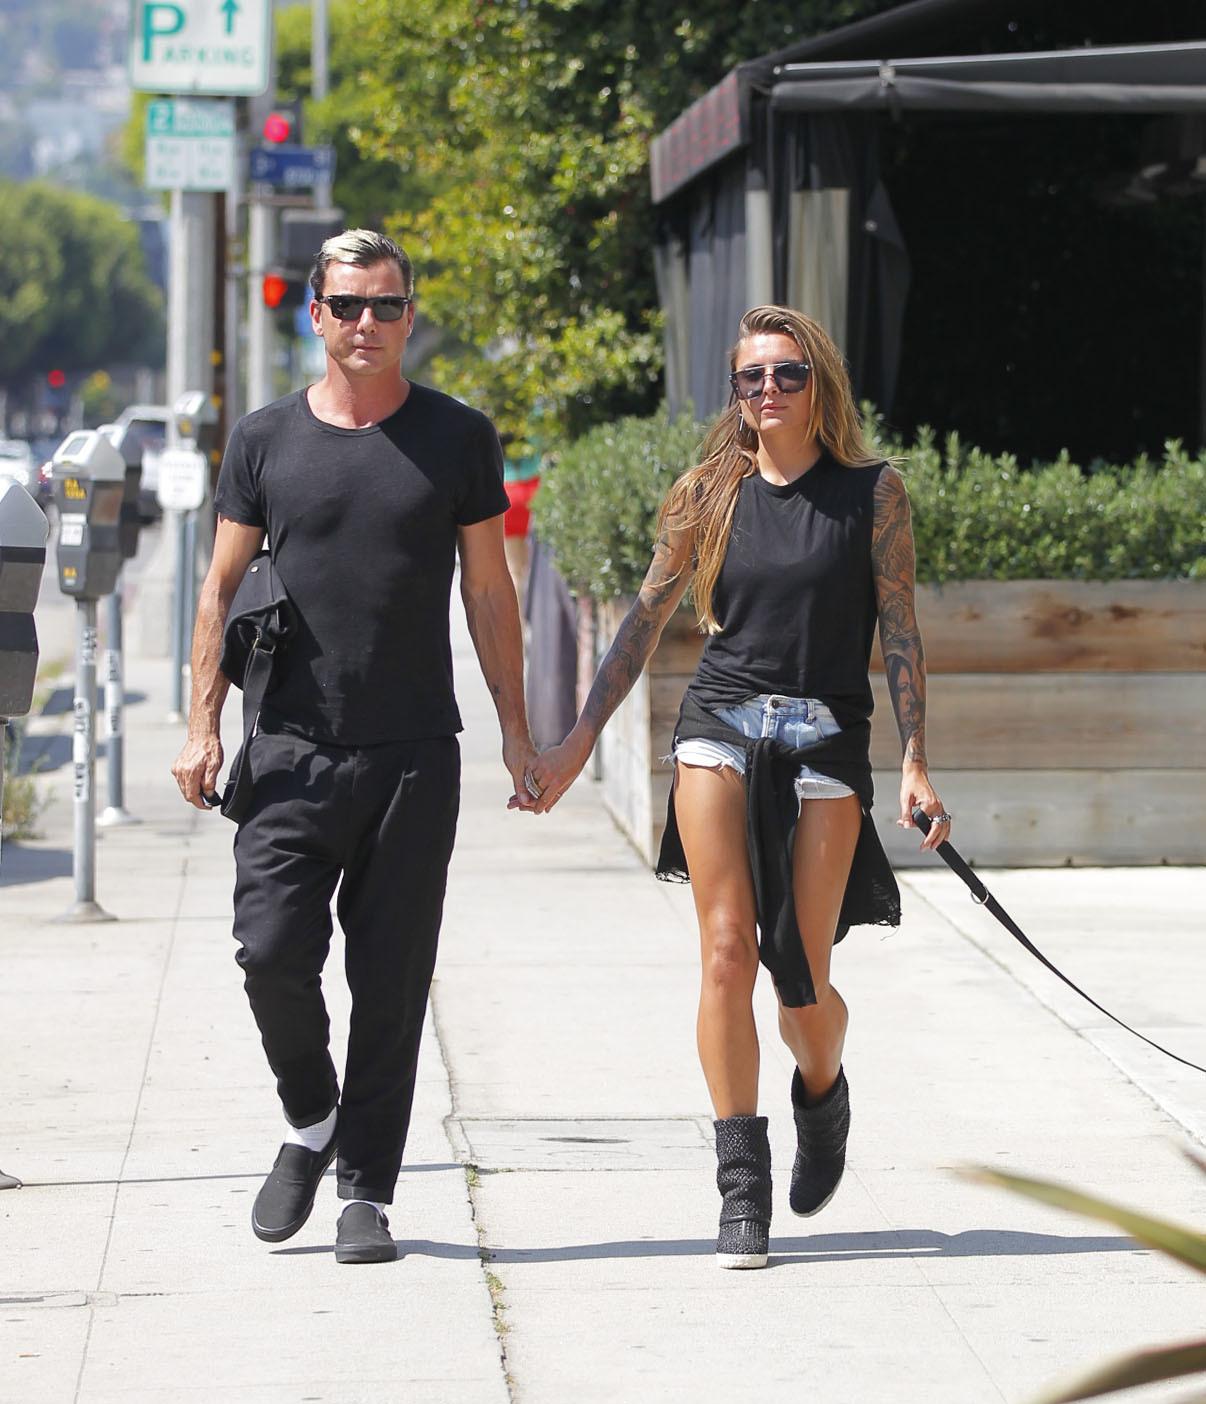 Gavin Rossdale and Sophia Thomalla